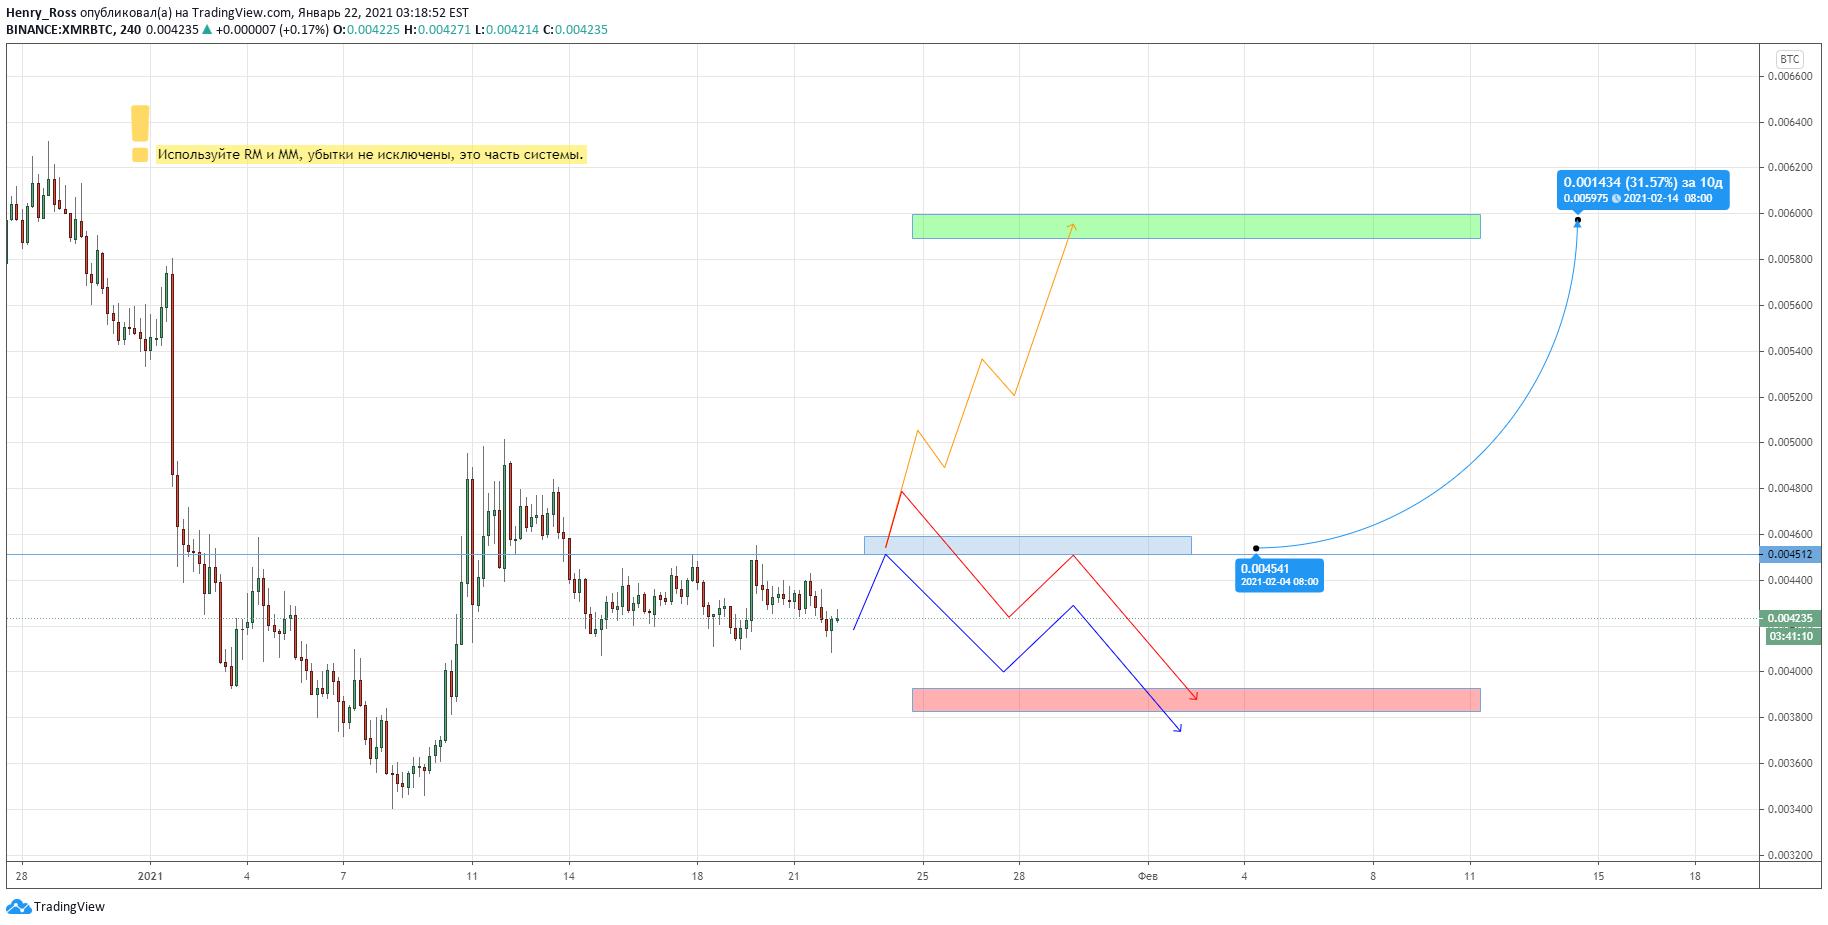 tradingview iop btc bitcoin trader trevor noah